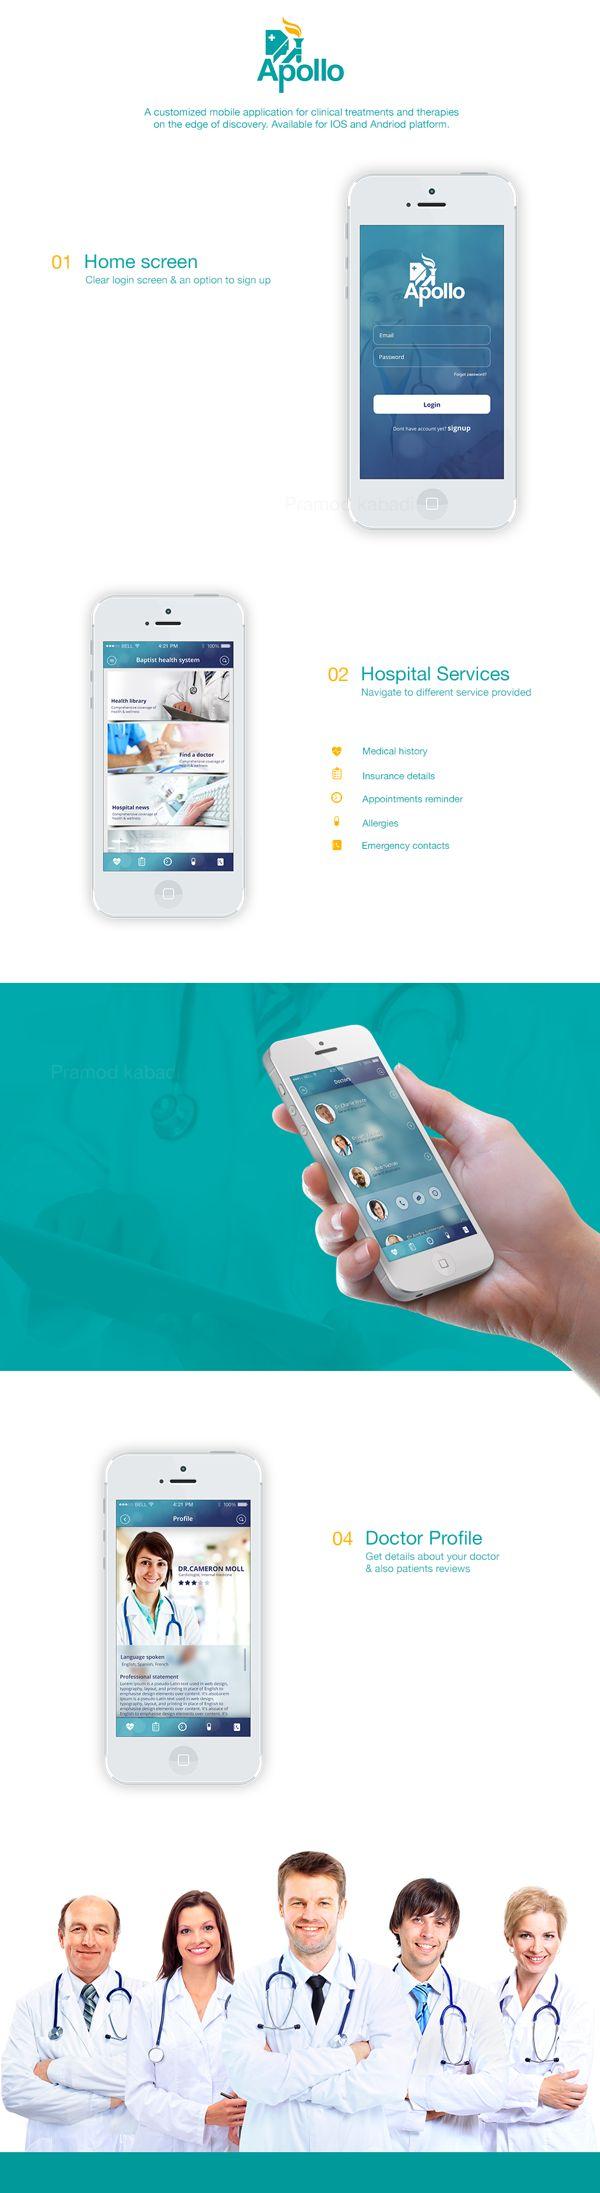 POC for a hospital services app on Behance